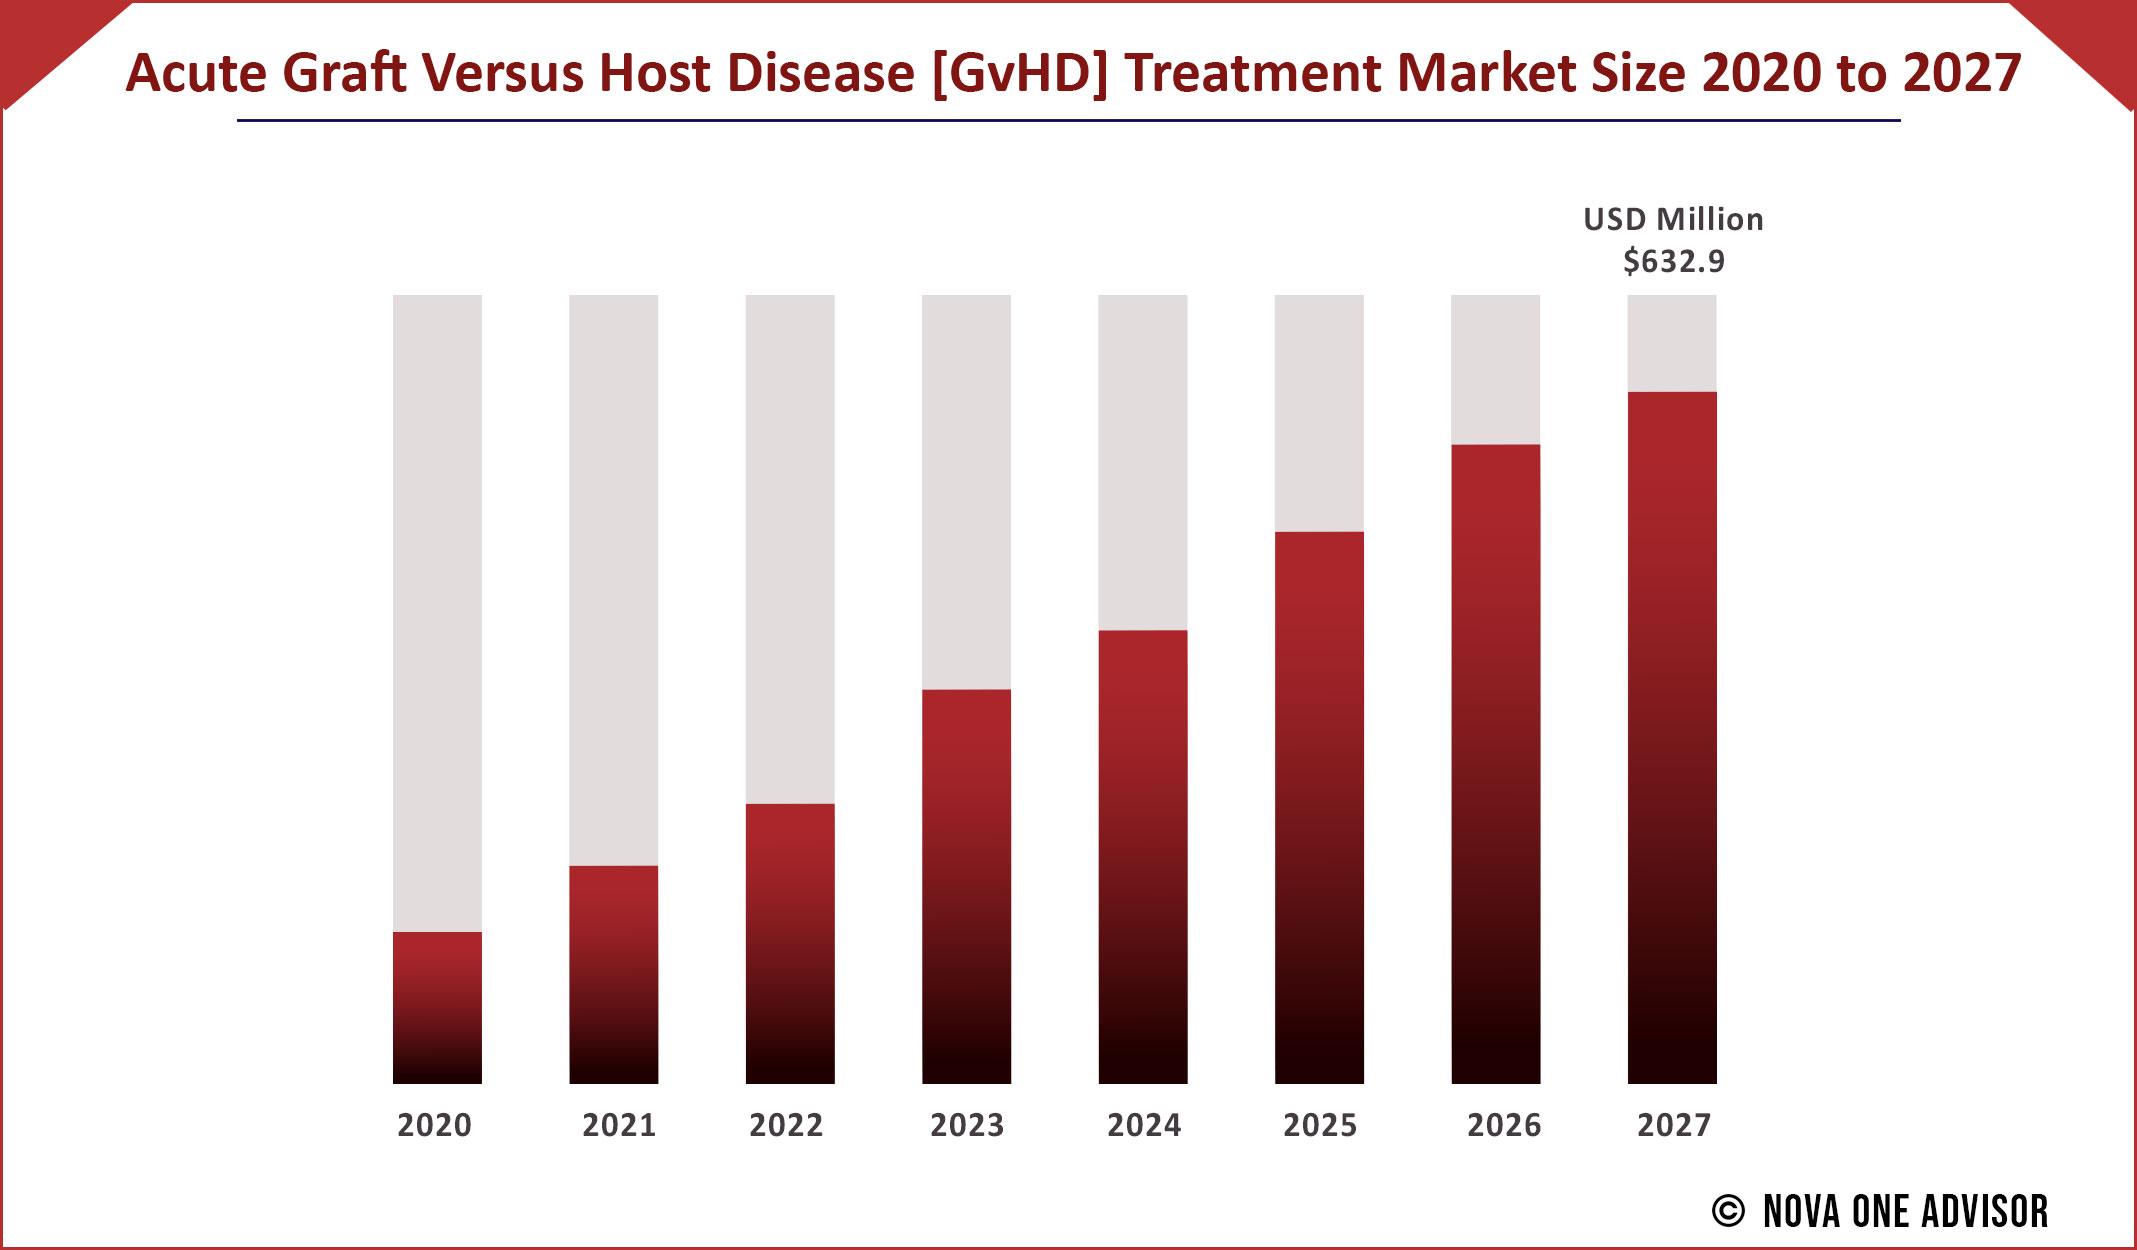 Acute Graft Versus Host Disease [GvHD] Treatment Market Size 2020 to 2027